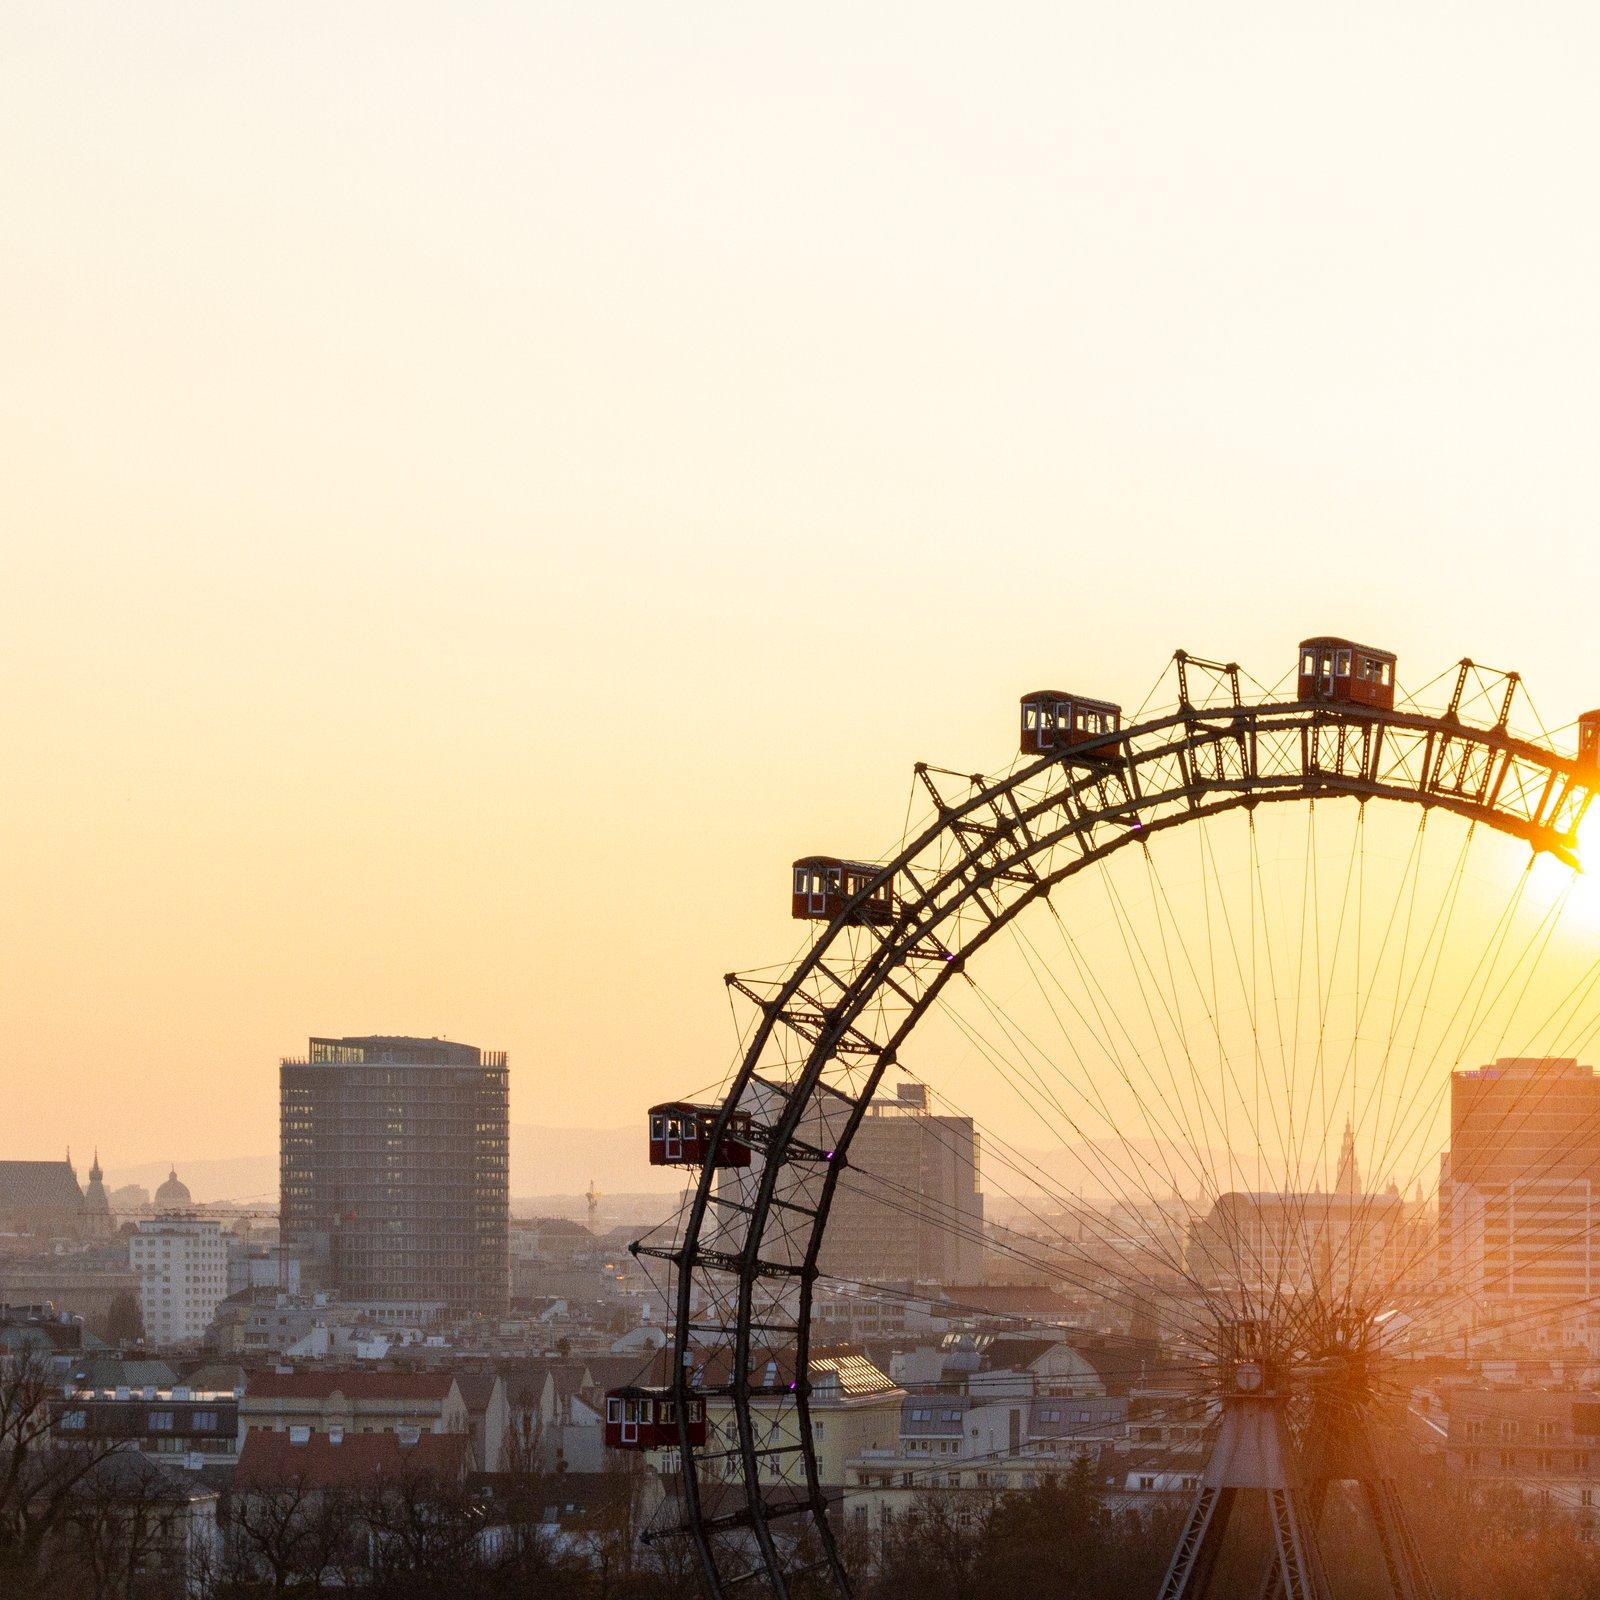 ferris wheel near city buildings during sunset